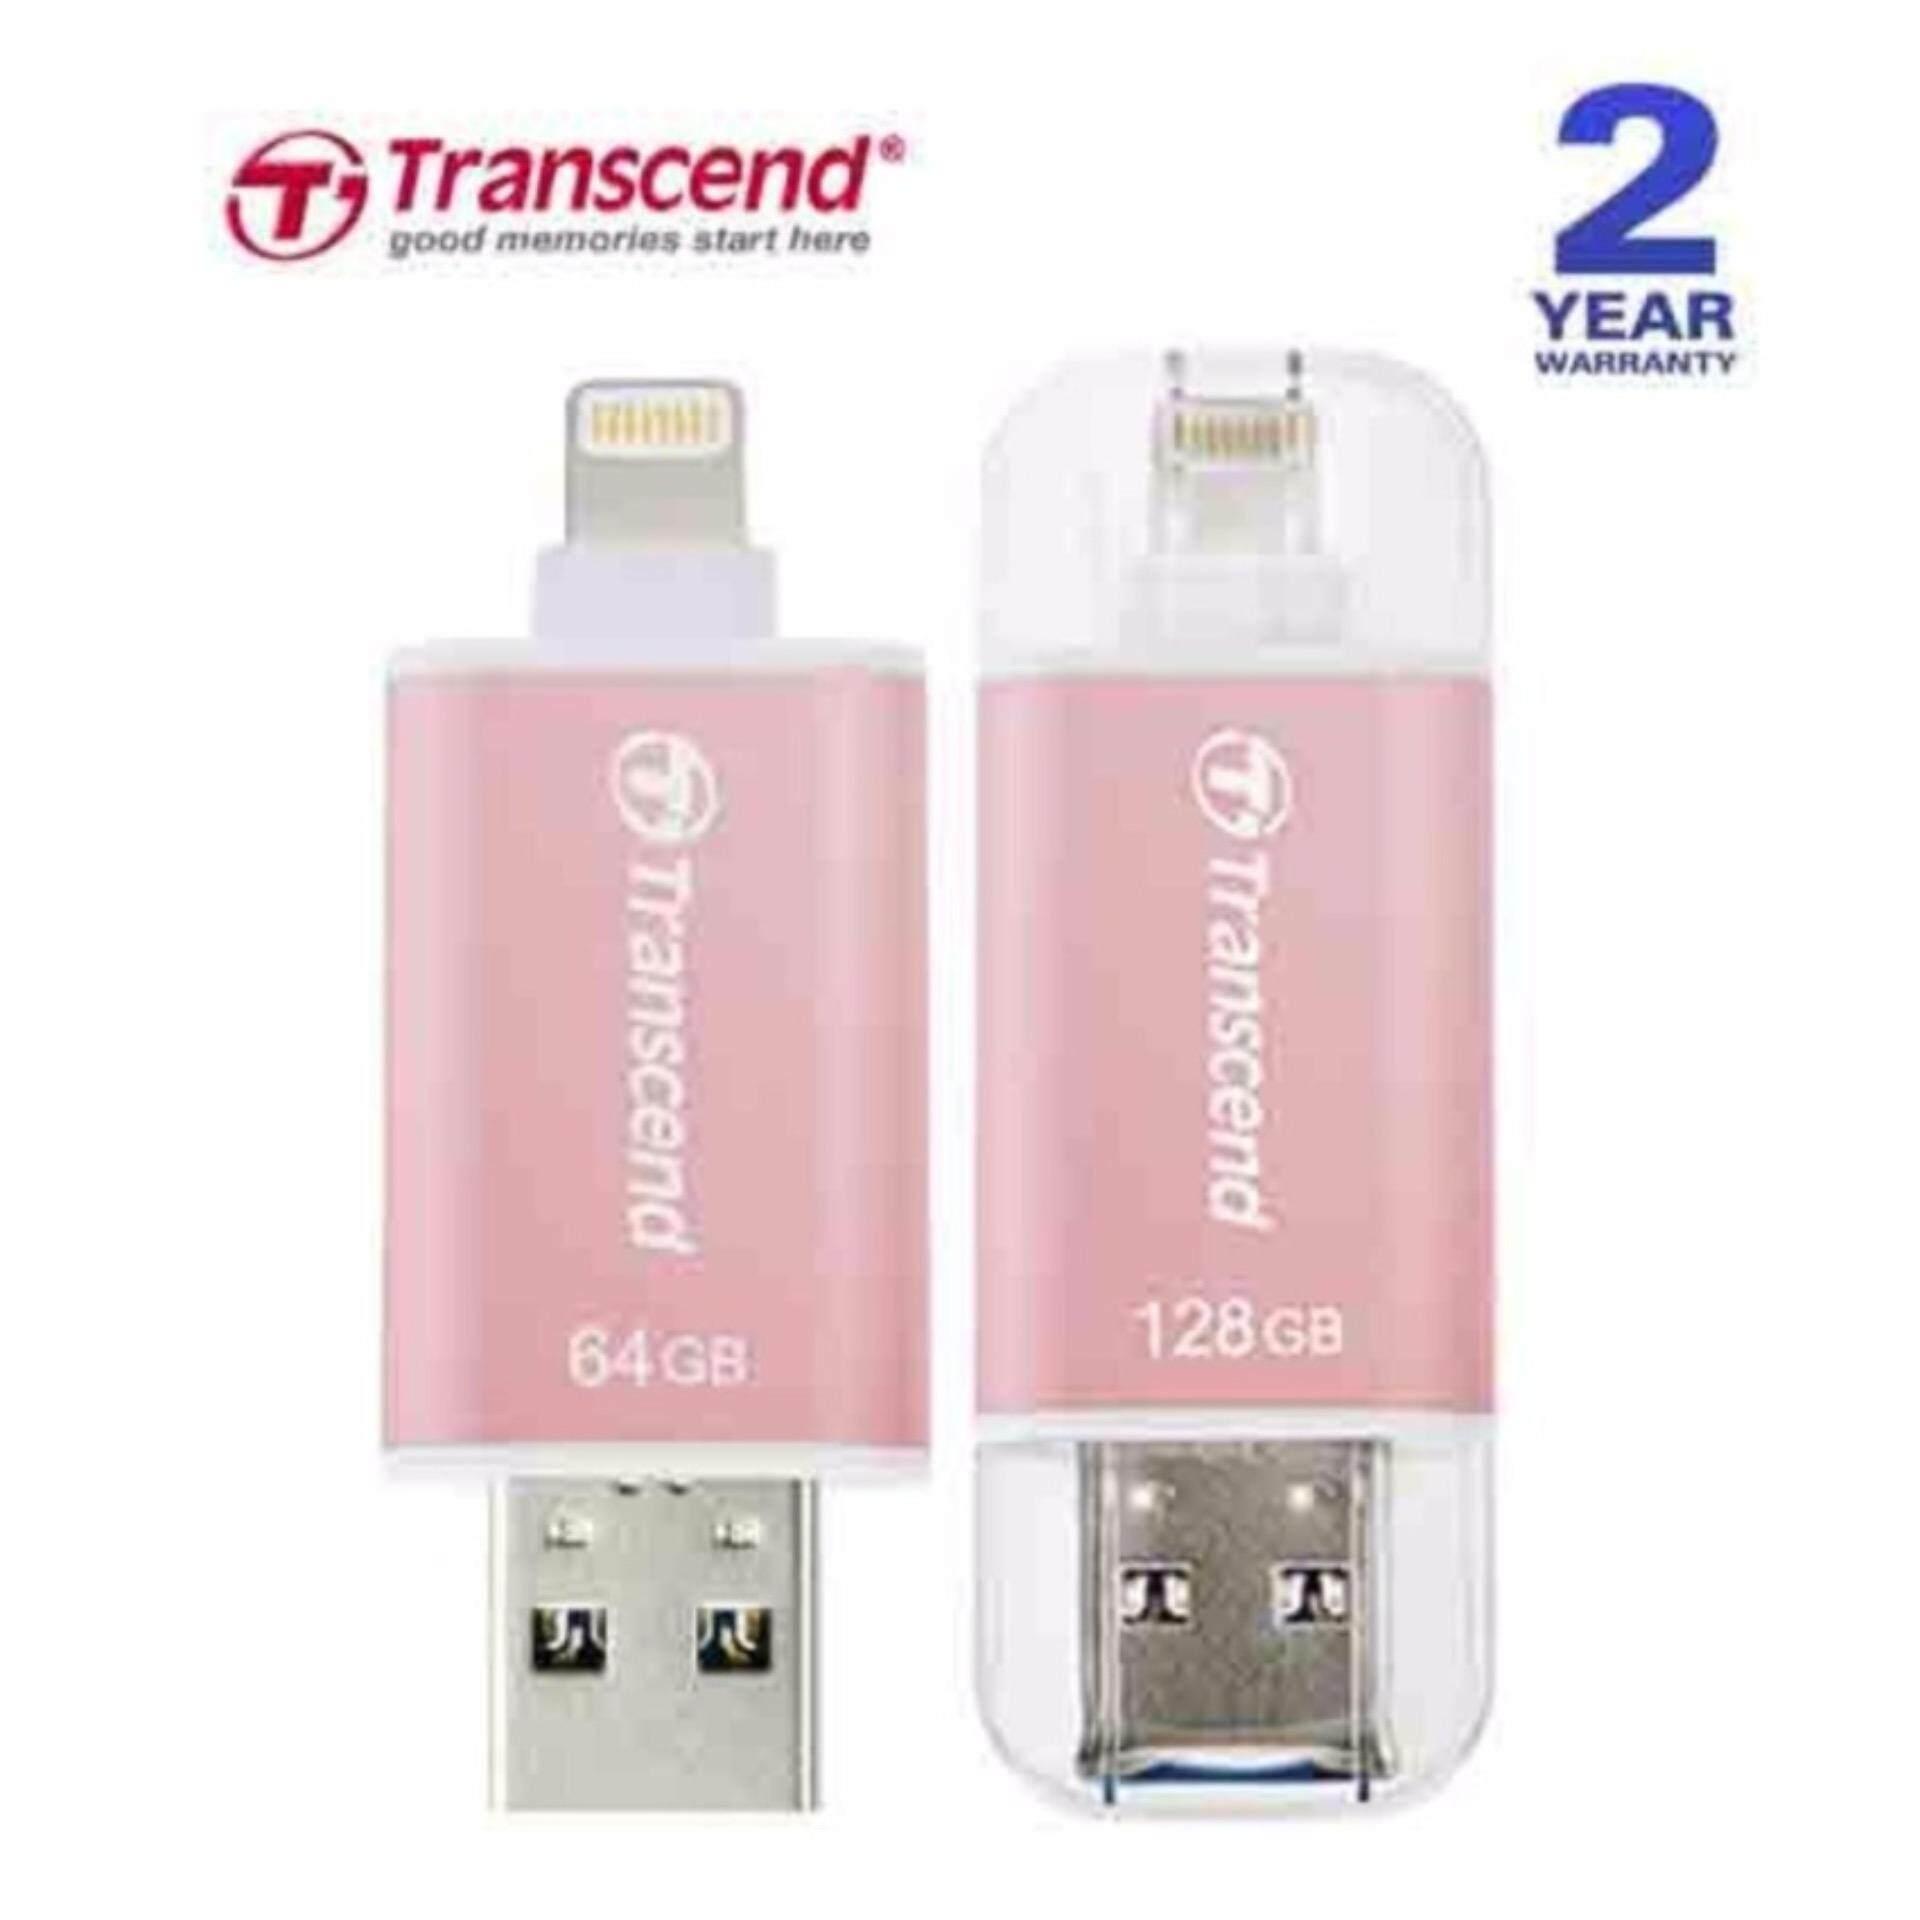 Apple Iphone Usb Flash Drive Sandisk Ixpand Flashdisk Lightning 30 128gb Sdix30c 128g Transcend Jetdrive Go Otg Pen Thumb For Ios